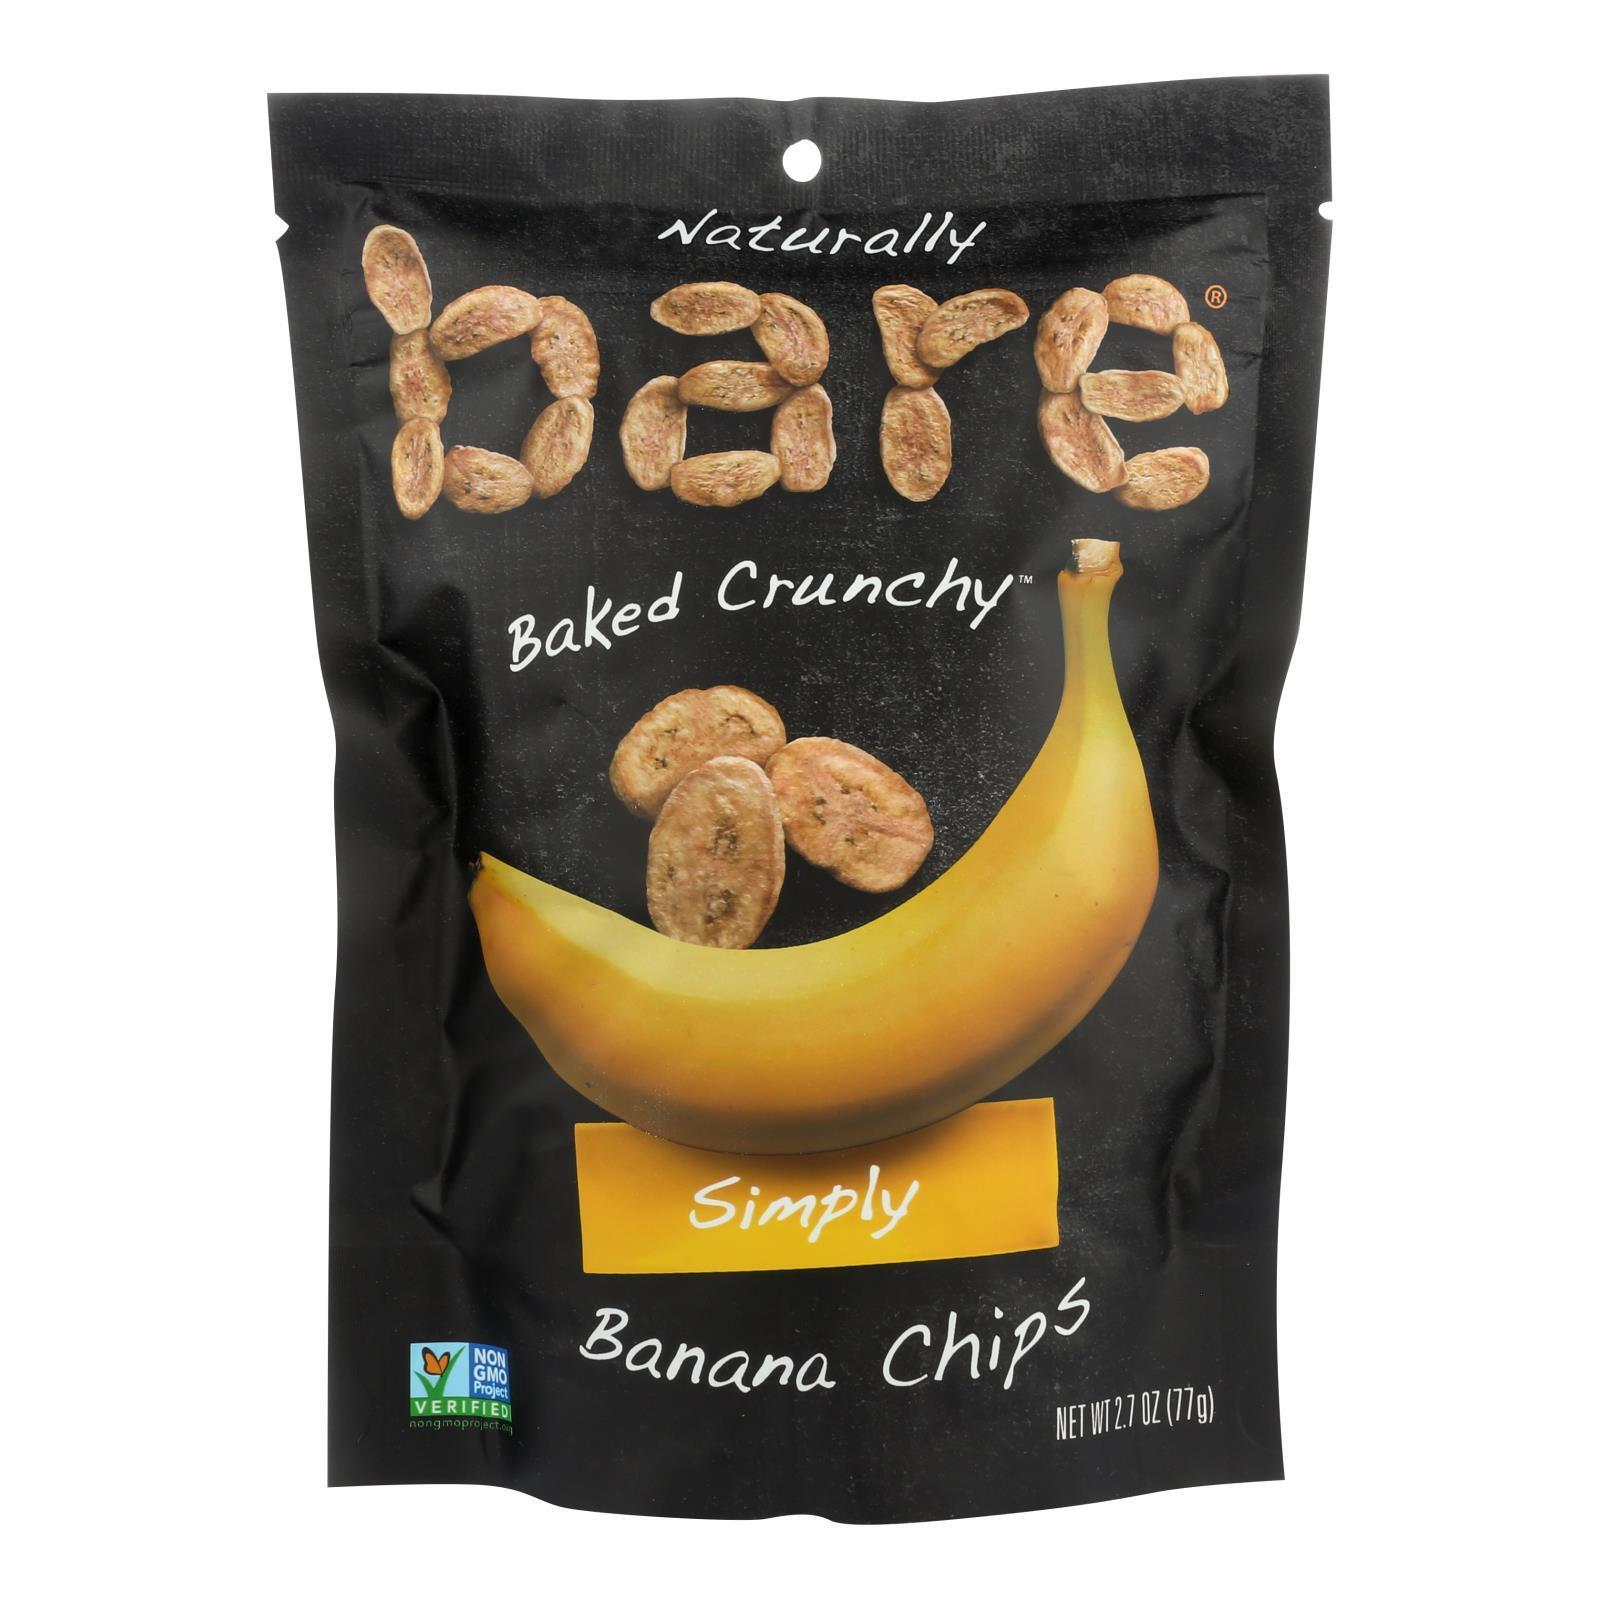 Bare Fruit Bare Fruit Bare Fruit Banana Chip - Case of 12 - 2.7 oz.